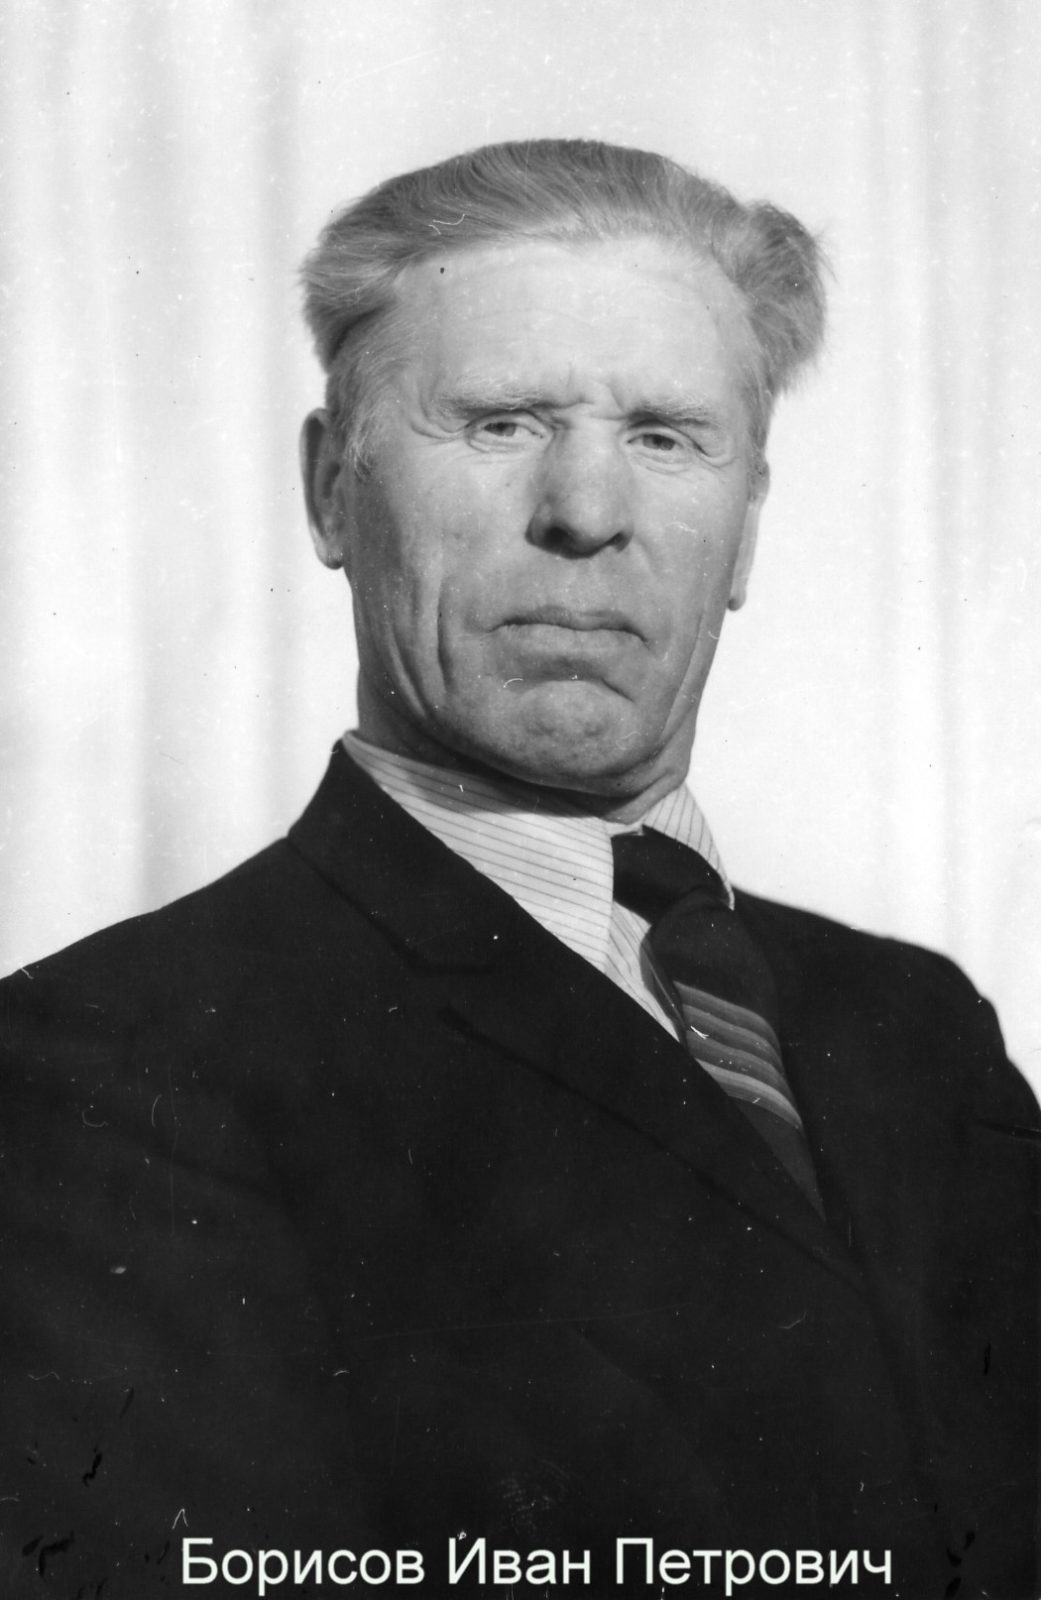 Борисов Иван Петрович.